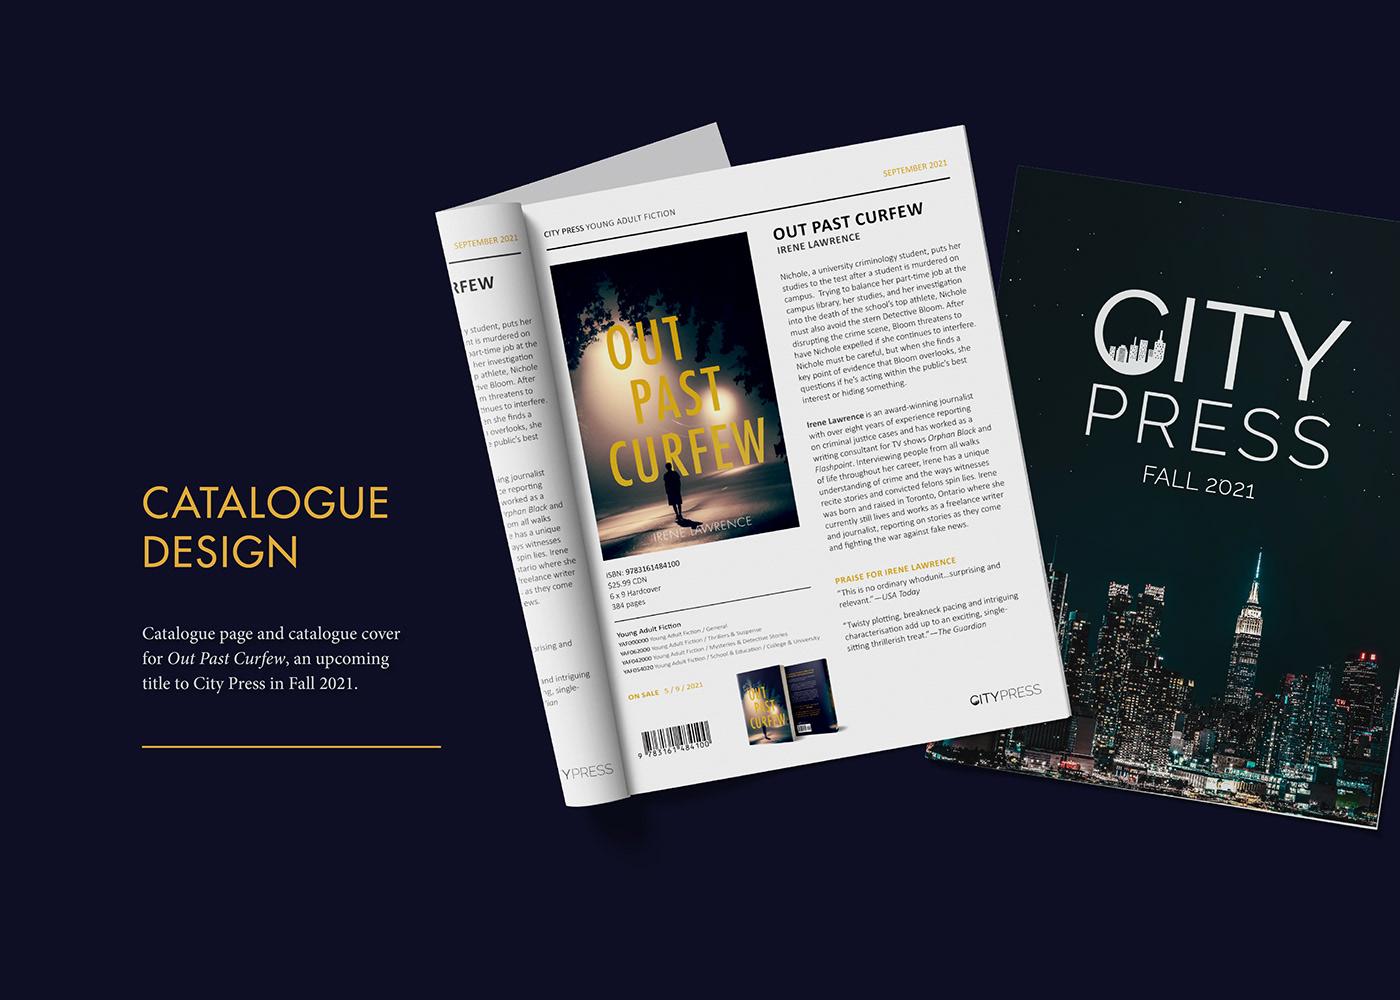 book Catalogue cover design logo product publishing   school